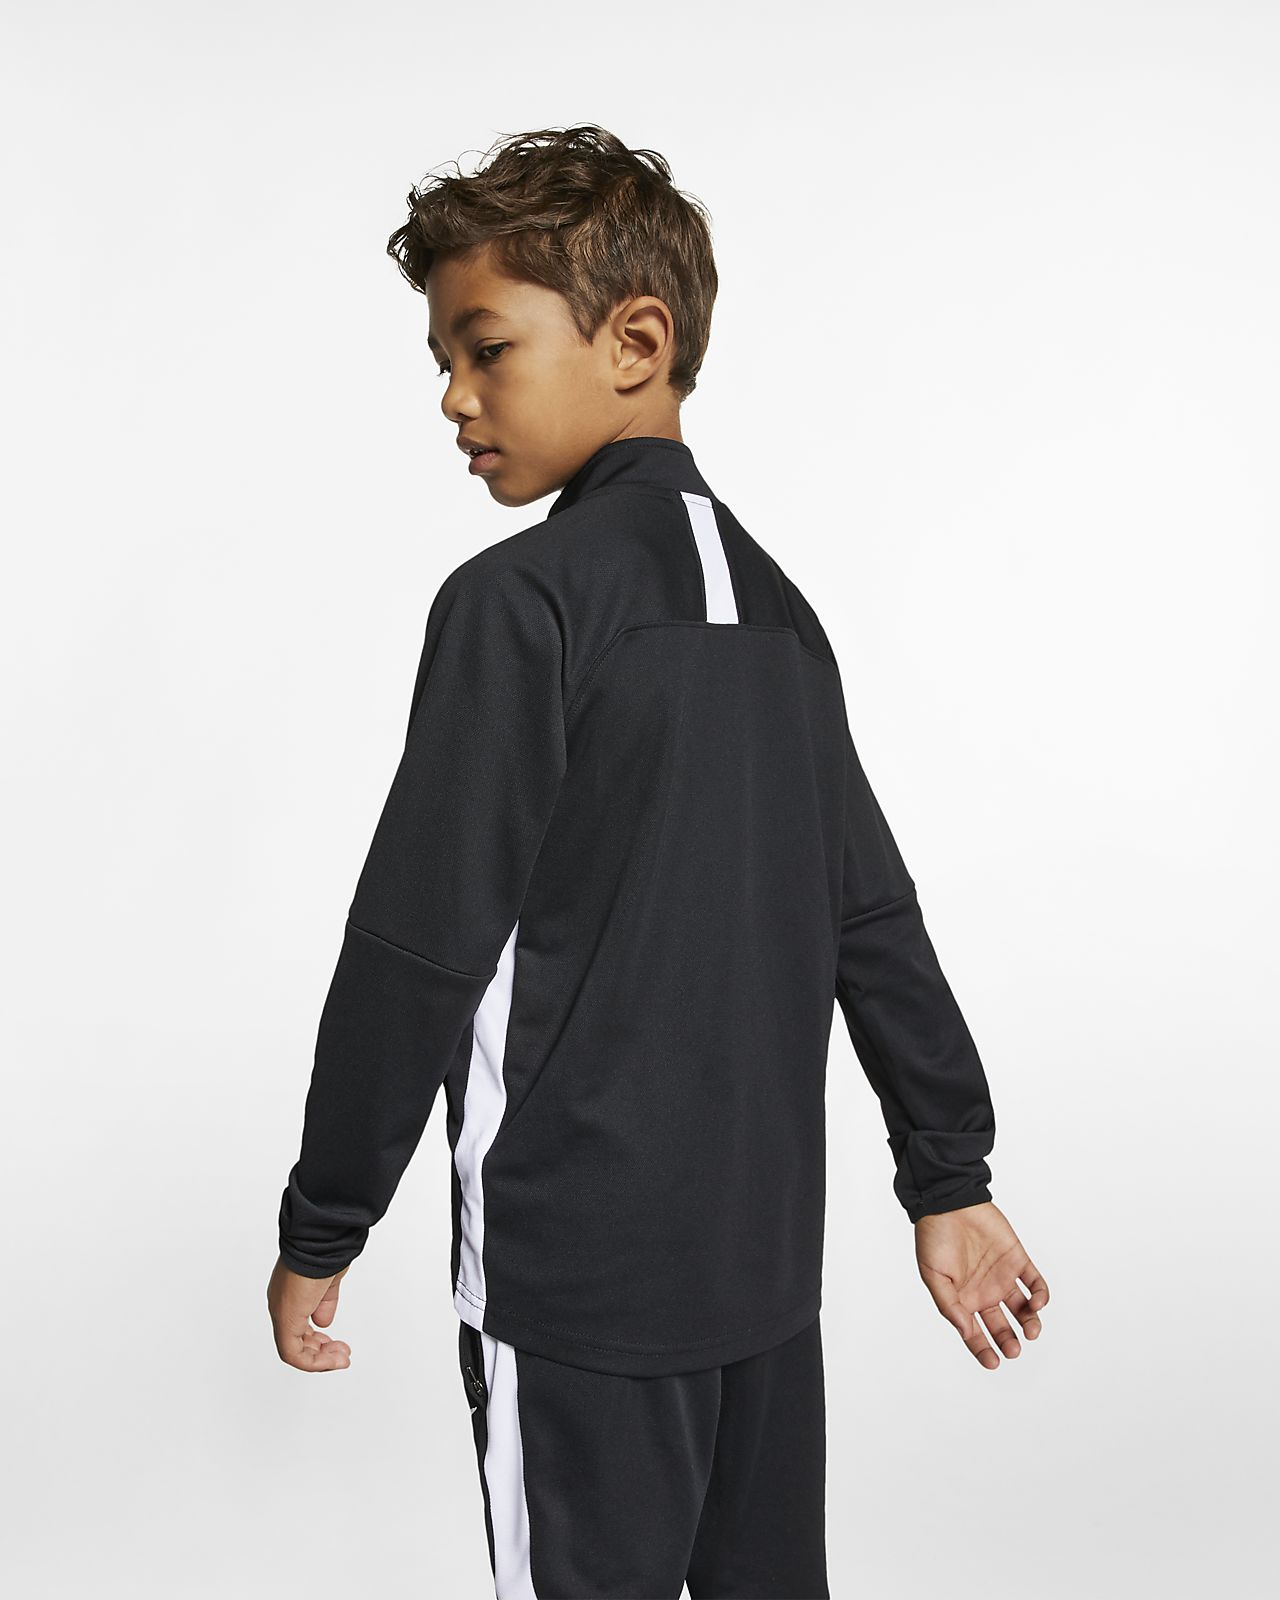 Nike Kinder Fussball Freizeit Trainingsanzug Dri-Fit Academy Tracksuit 2 schwarz